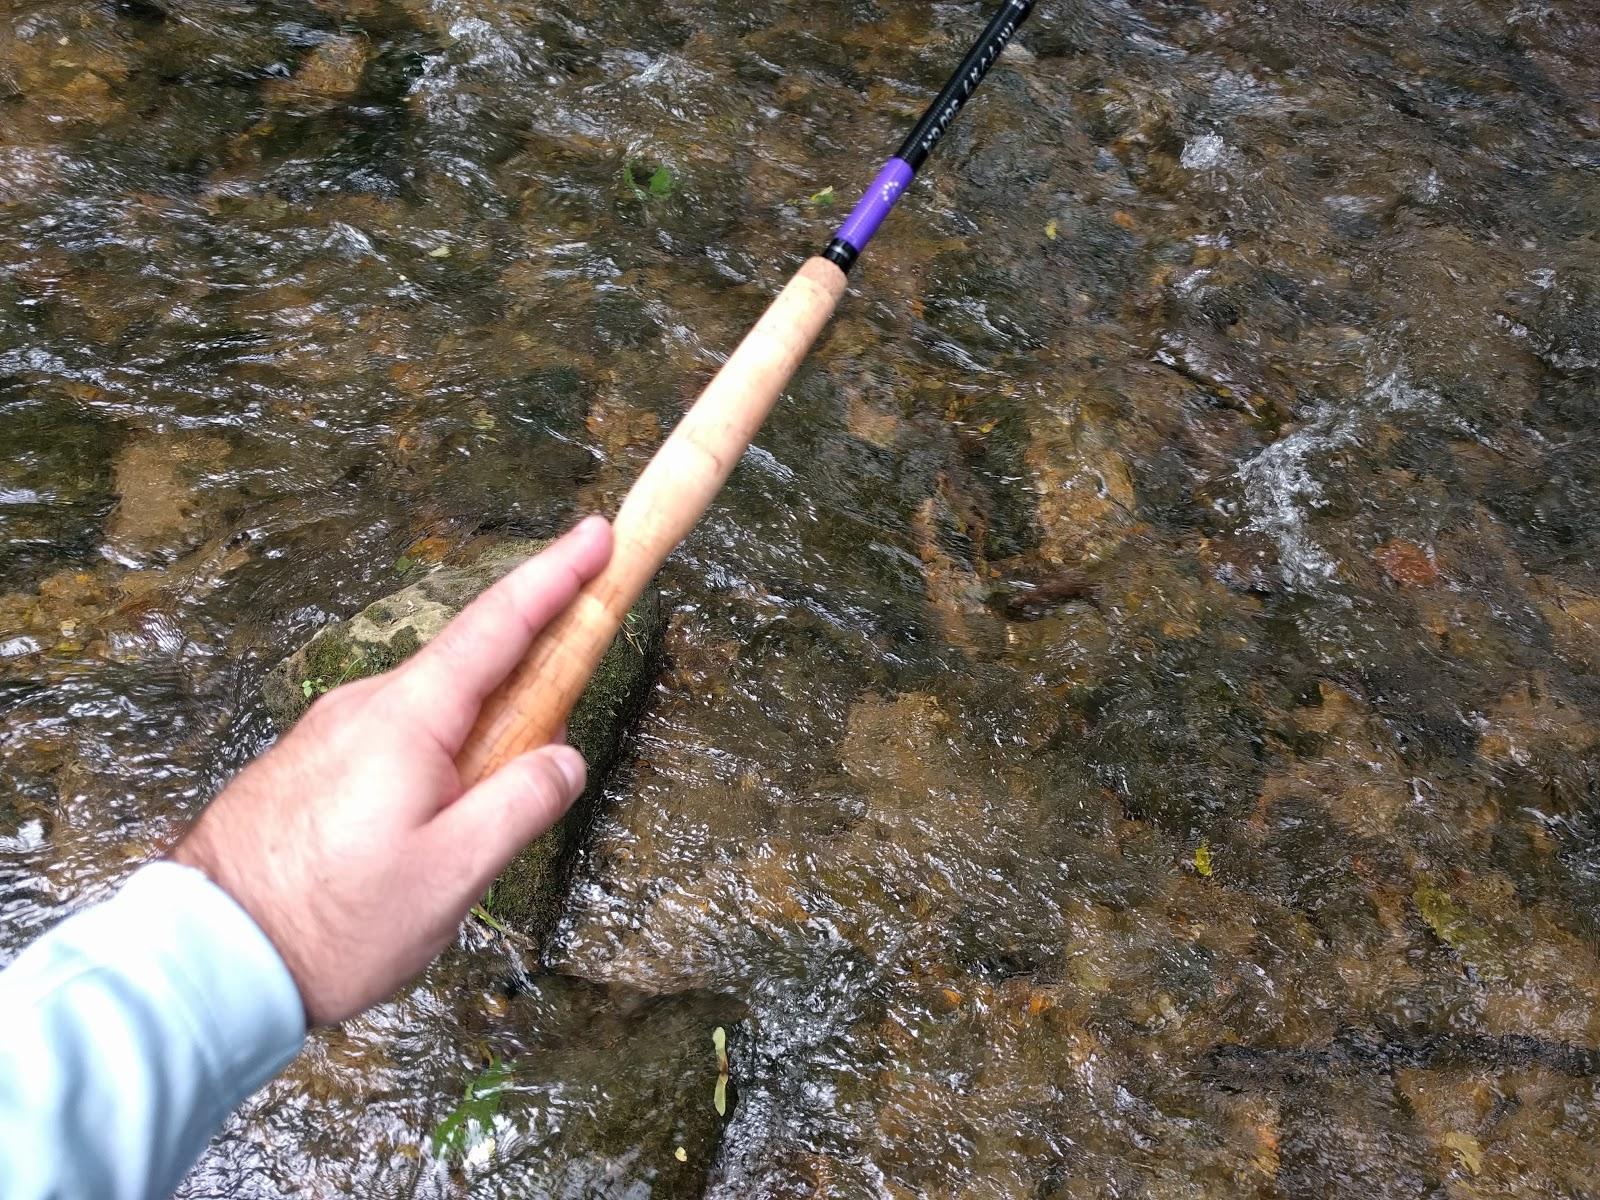 bc6c0d0ea7e Troutrageous! Fly Fishing   Tenkara Blog  Gear Review Update ...